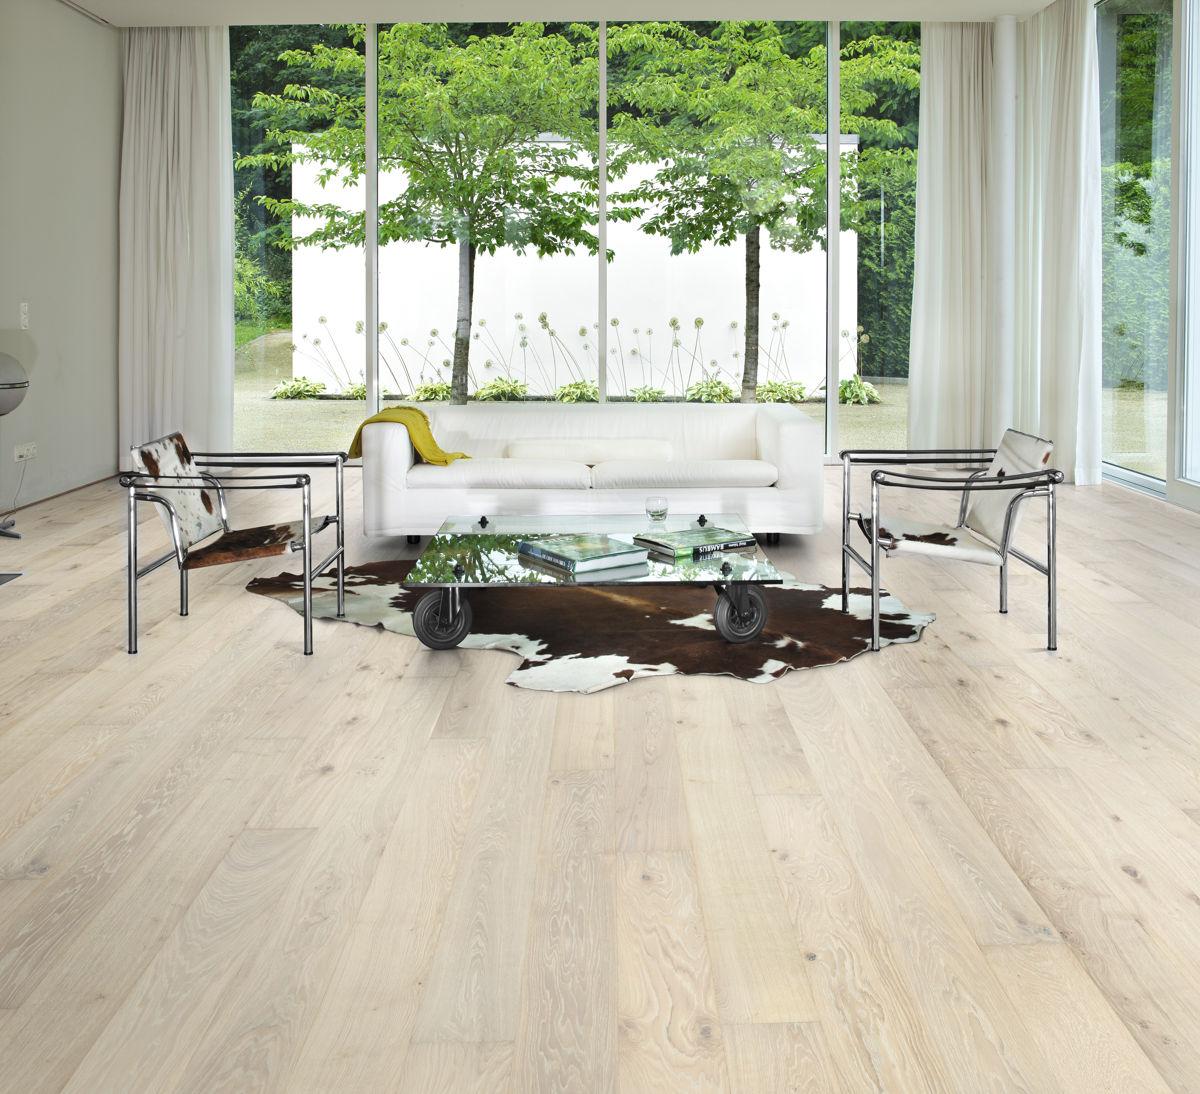 kahrs oak nouveau blonde engineered wood flooring. Black Bedroom Furniture Sets. Home Design Ideas